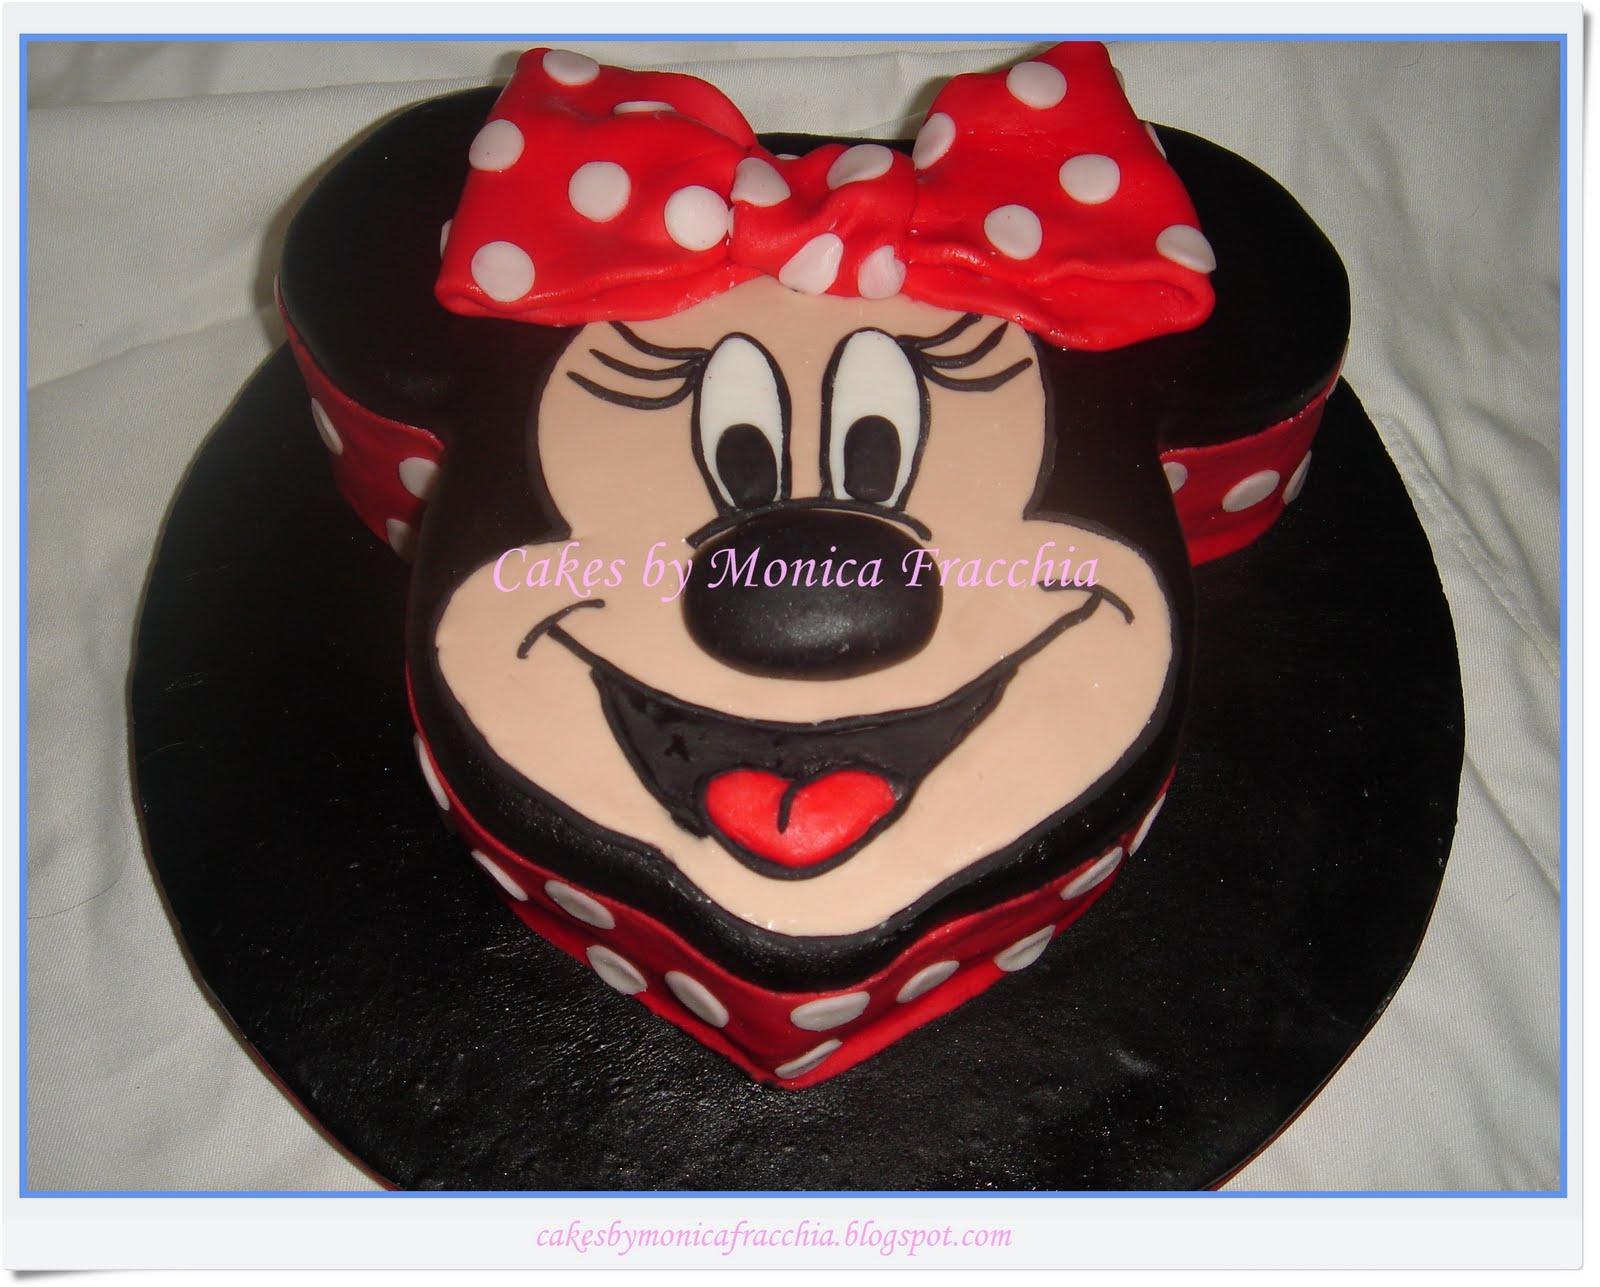 Pin tortas decoradas para bautismos fiesta infantil cake for Tortas decoradas infantiles